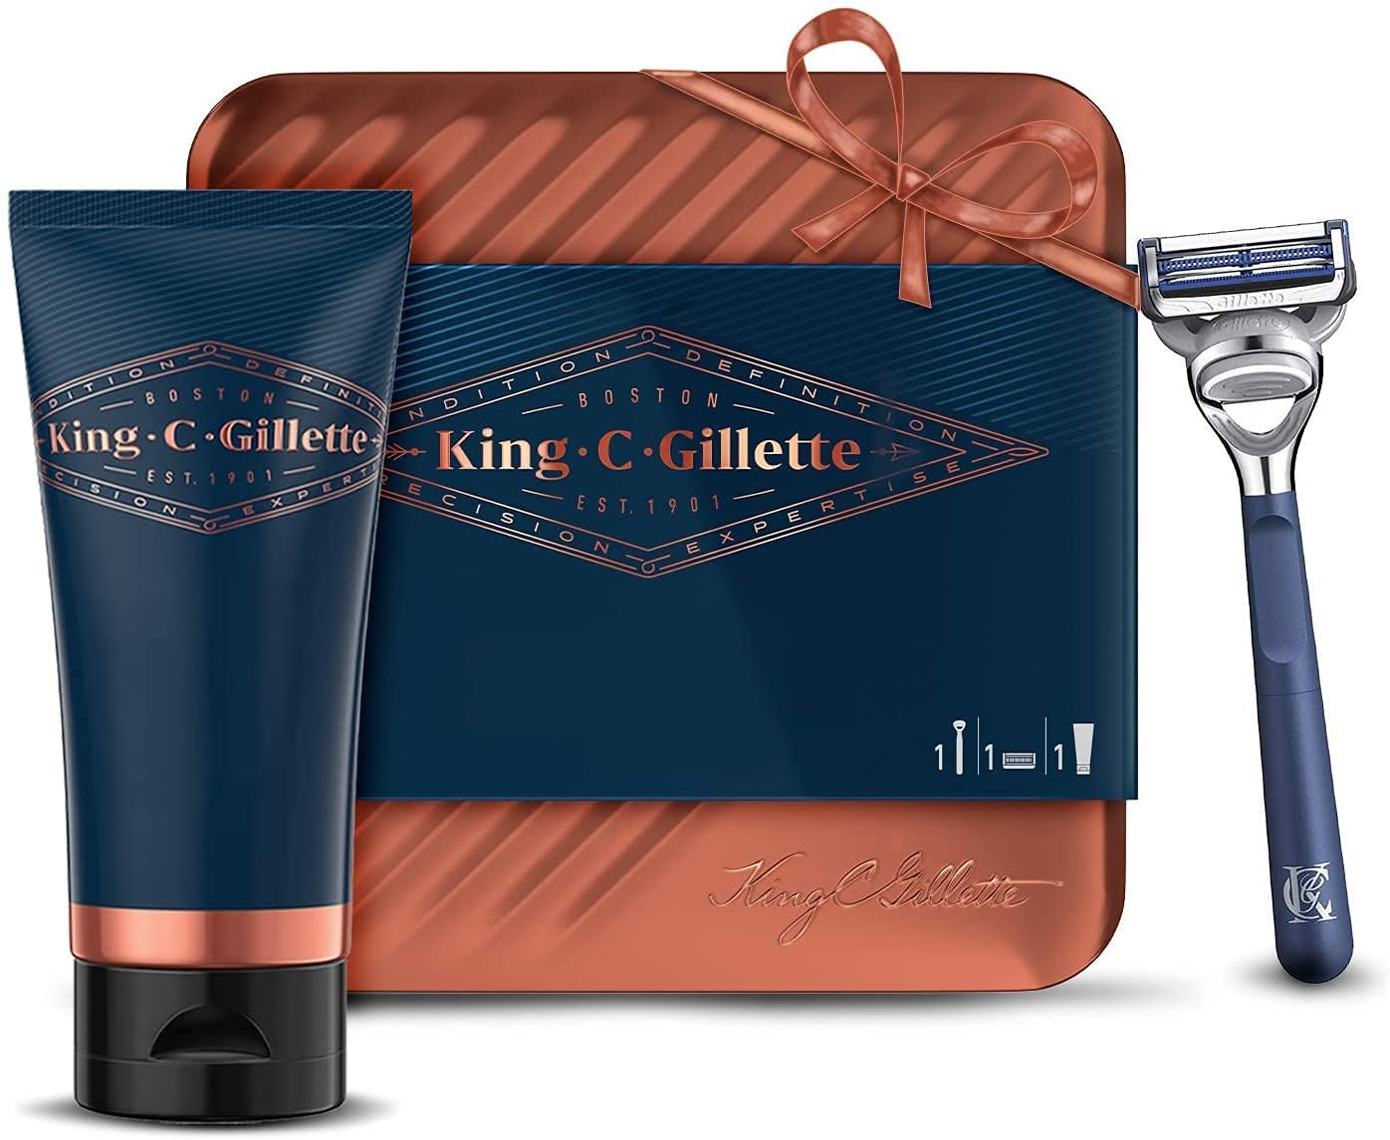 Gillette King mart C. Neck Razor for Transpare Max 73% OFF Blade Men + 1 Refill